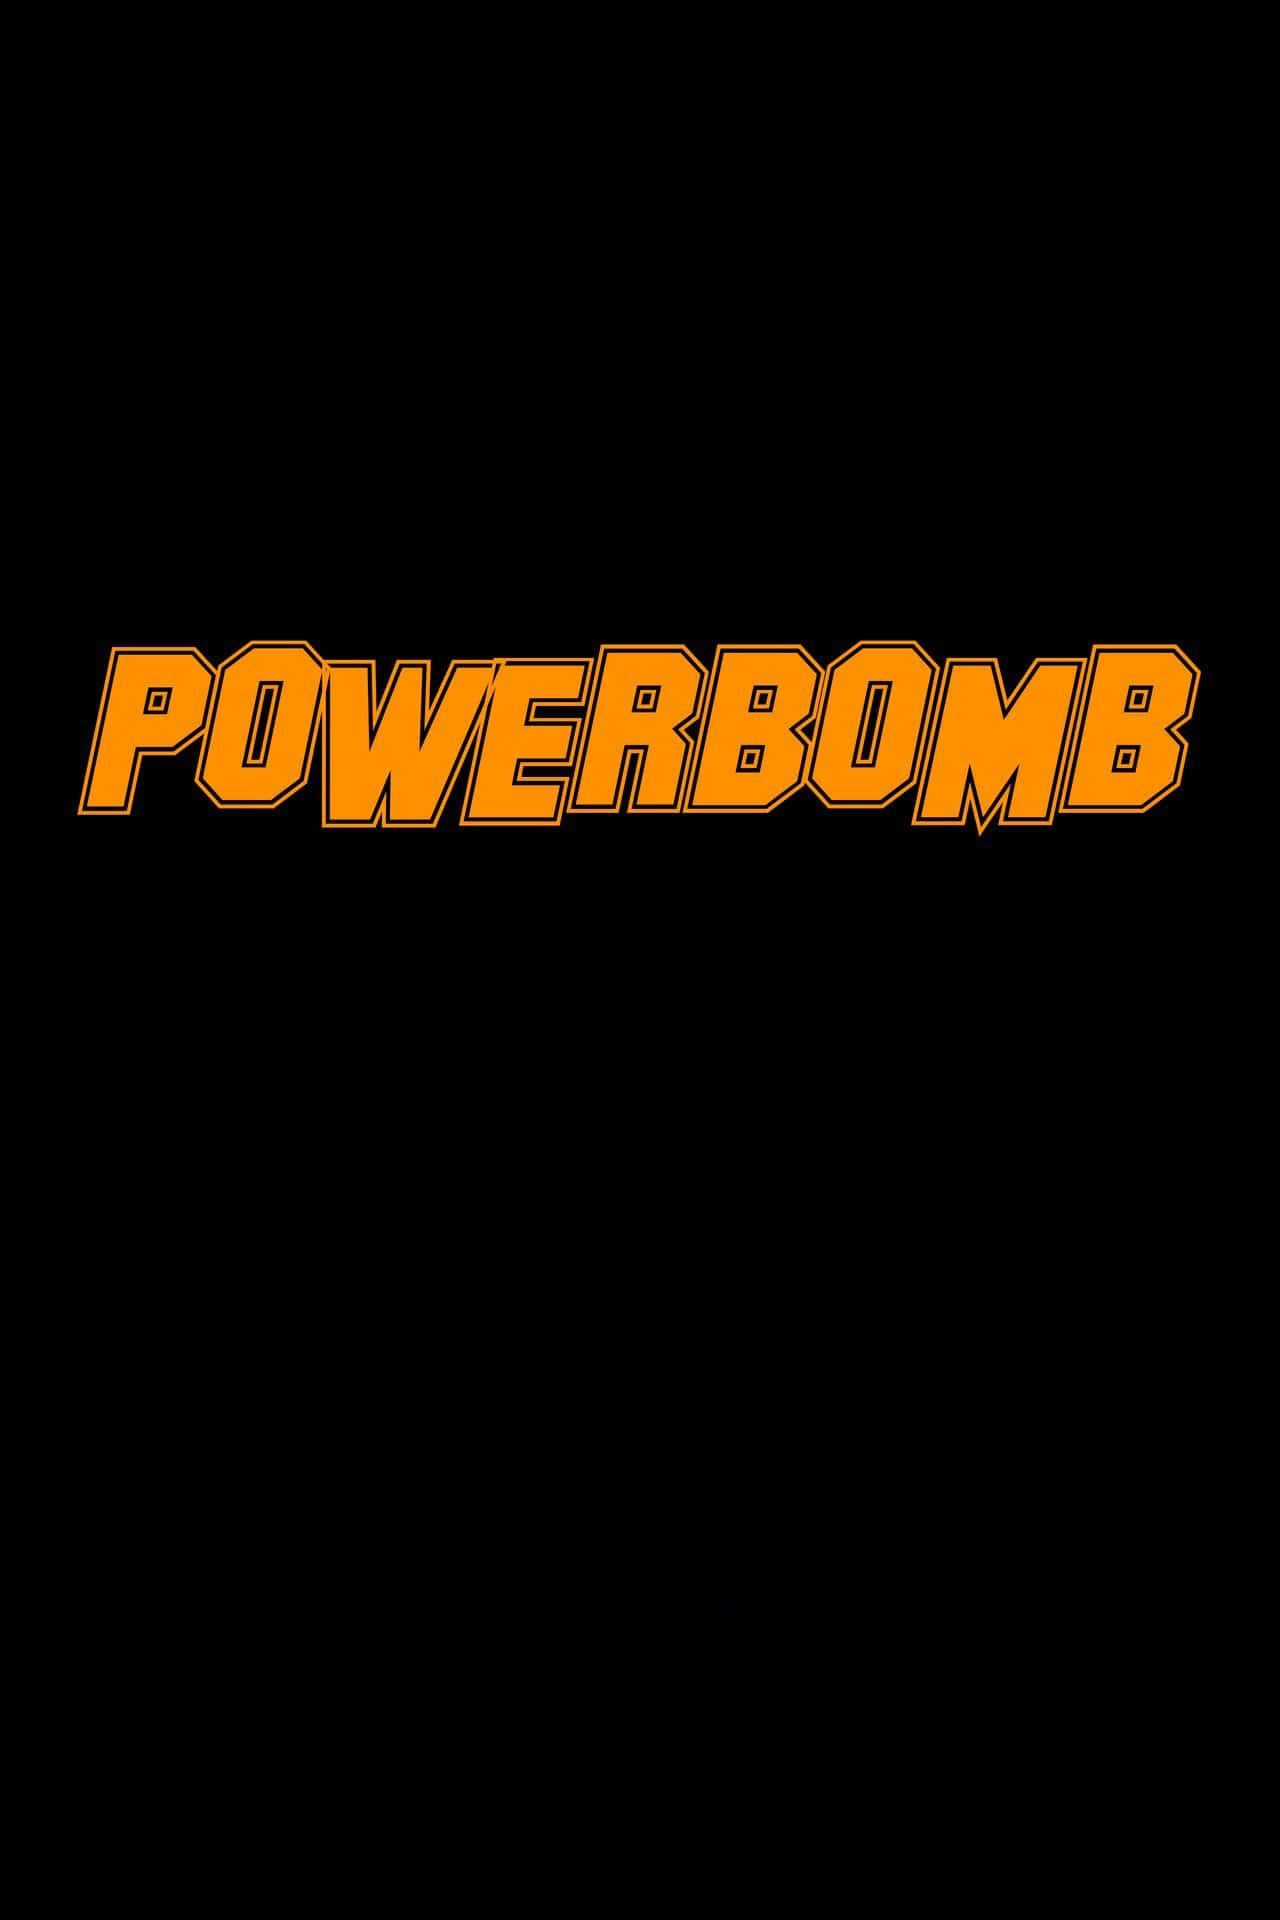 Regarder Powerbomb en streaming gratuit